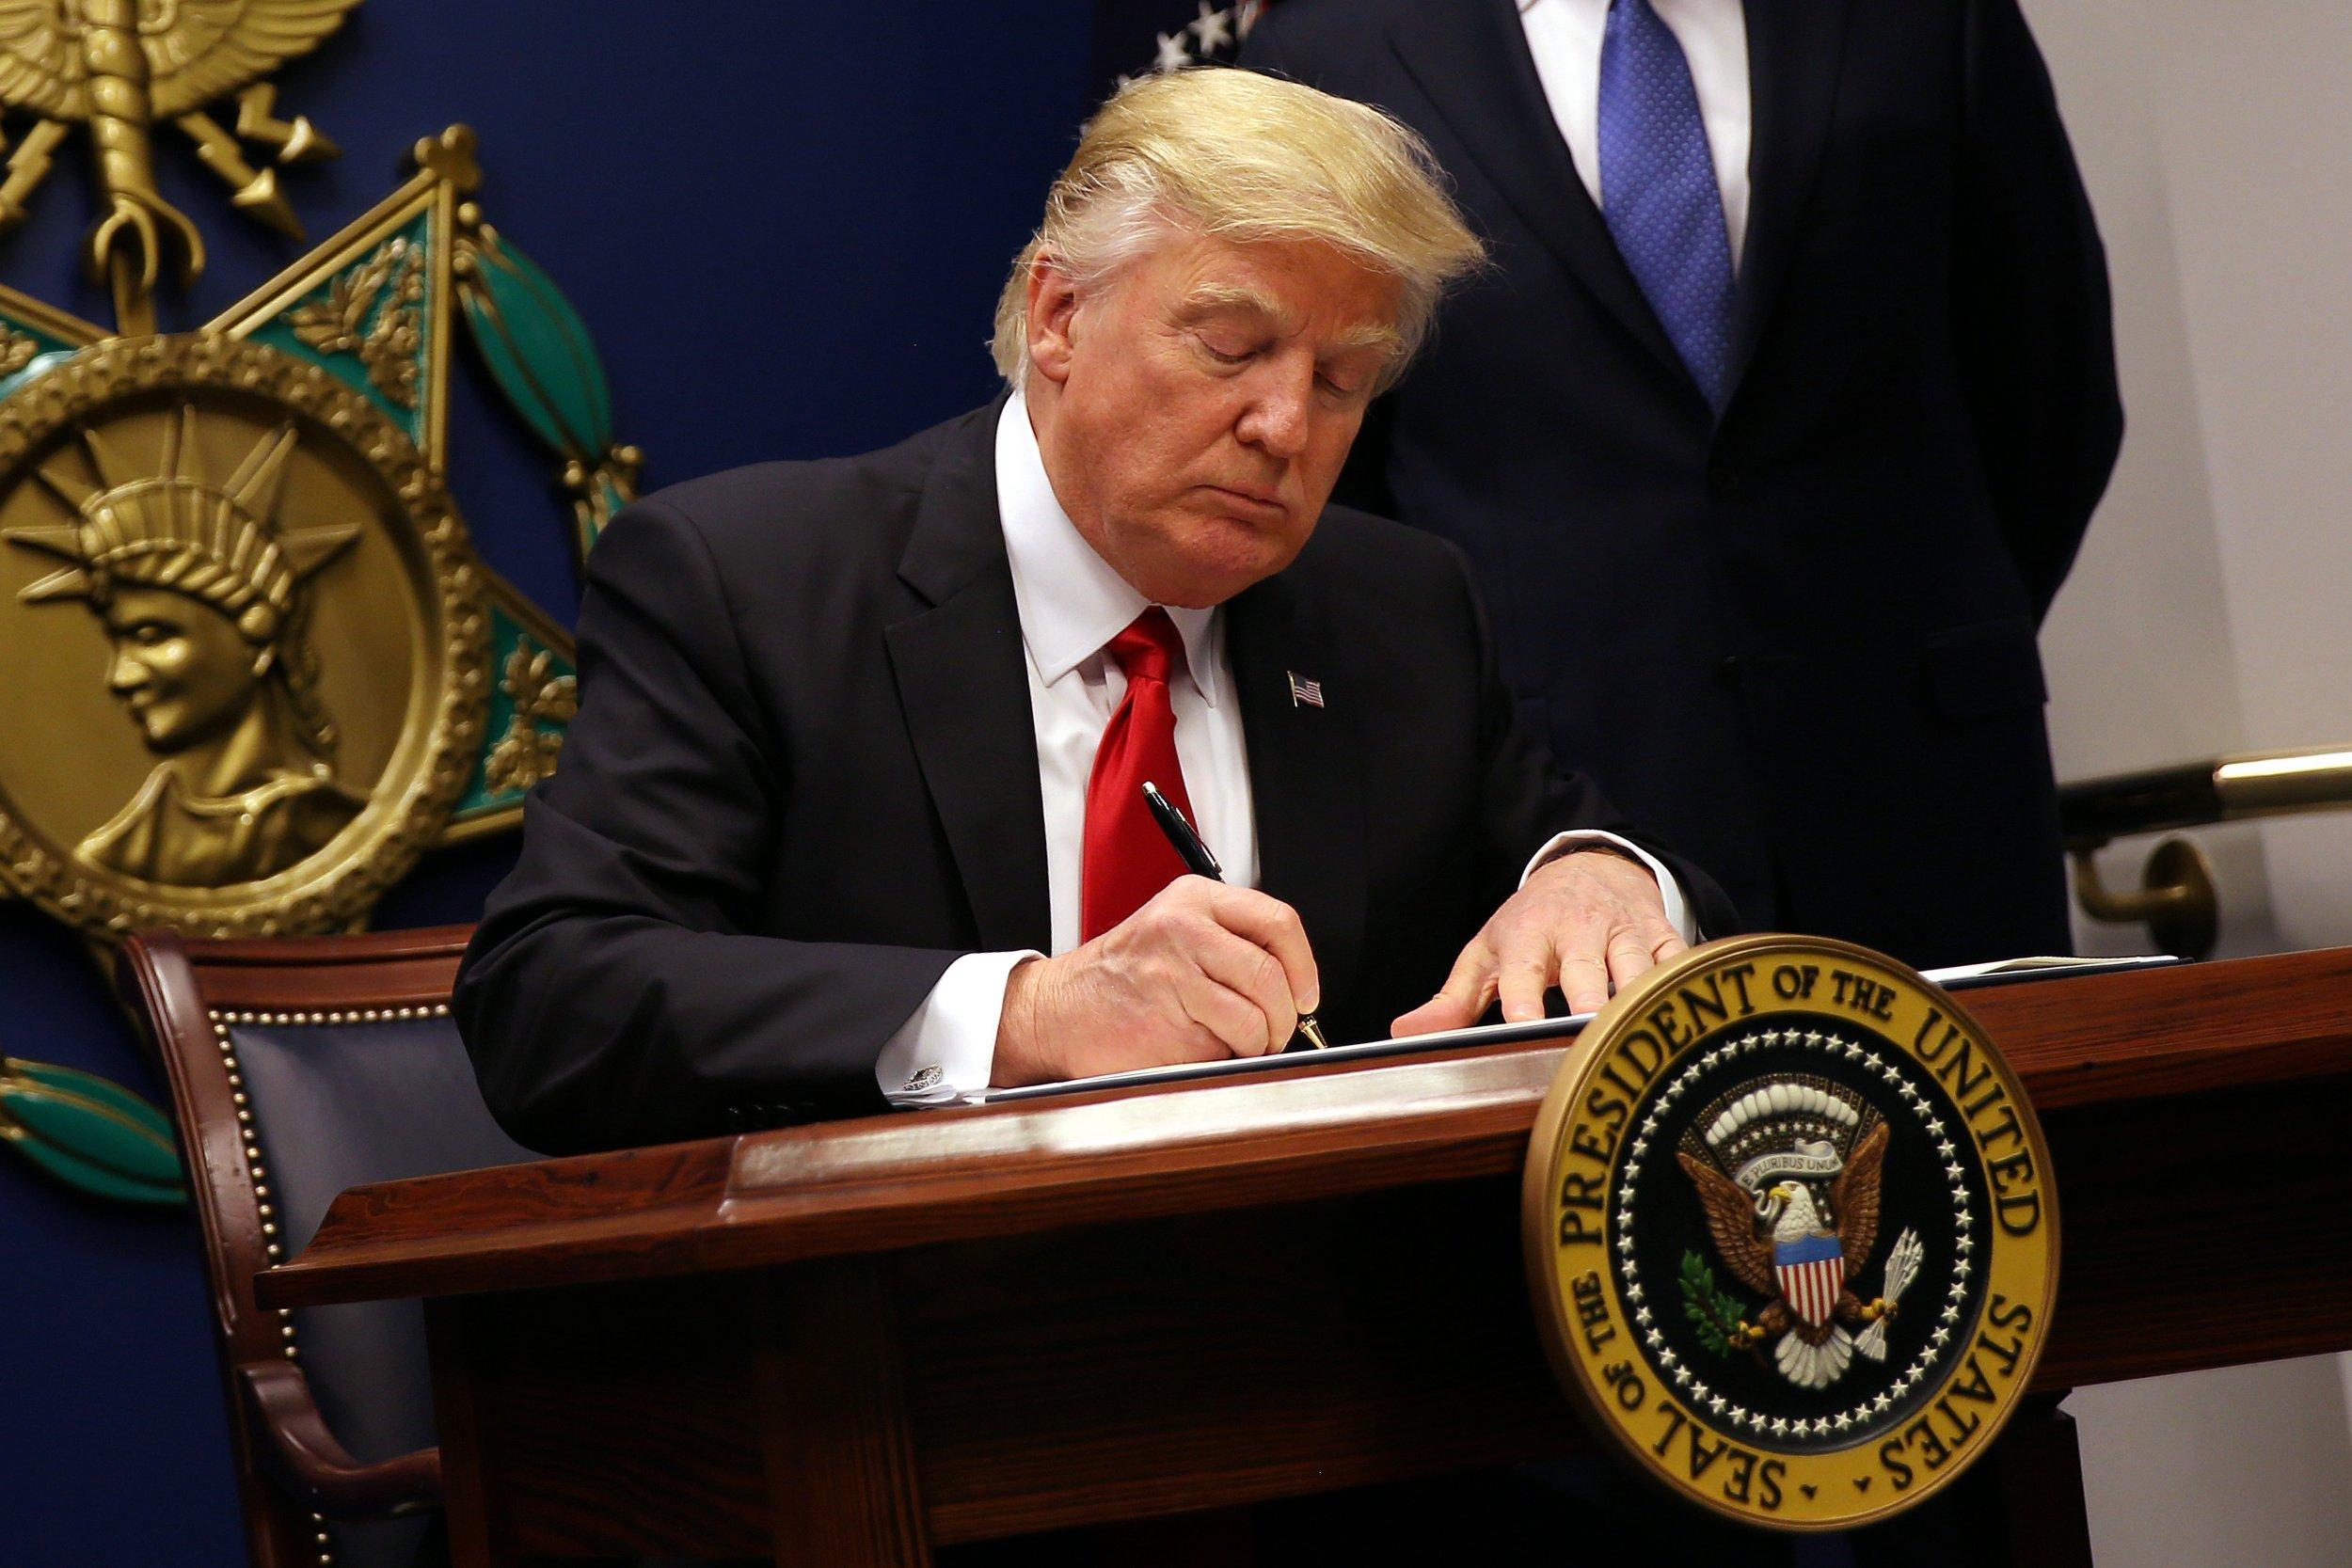 0202_Donald_Trump_executive_orders_01